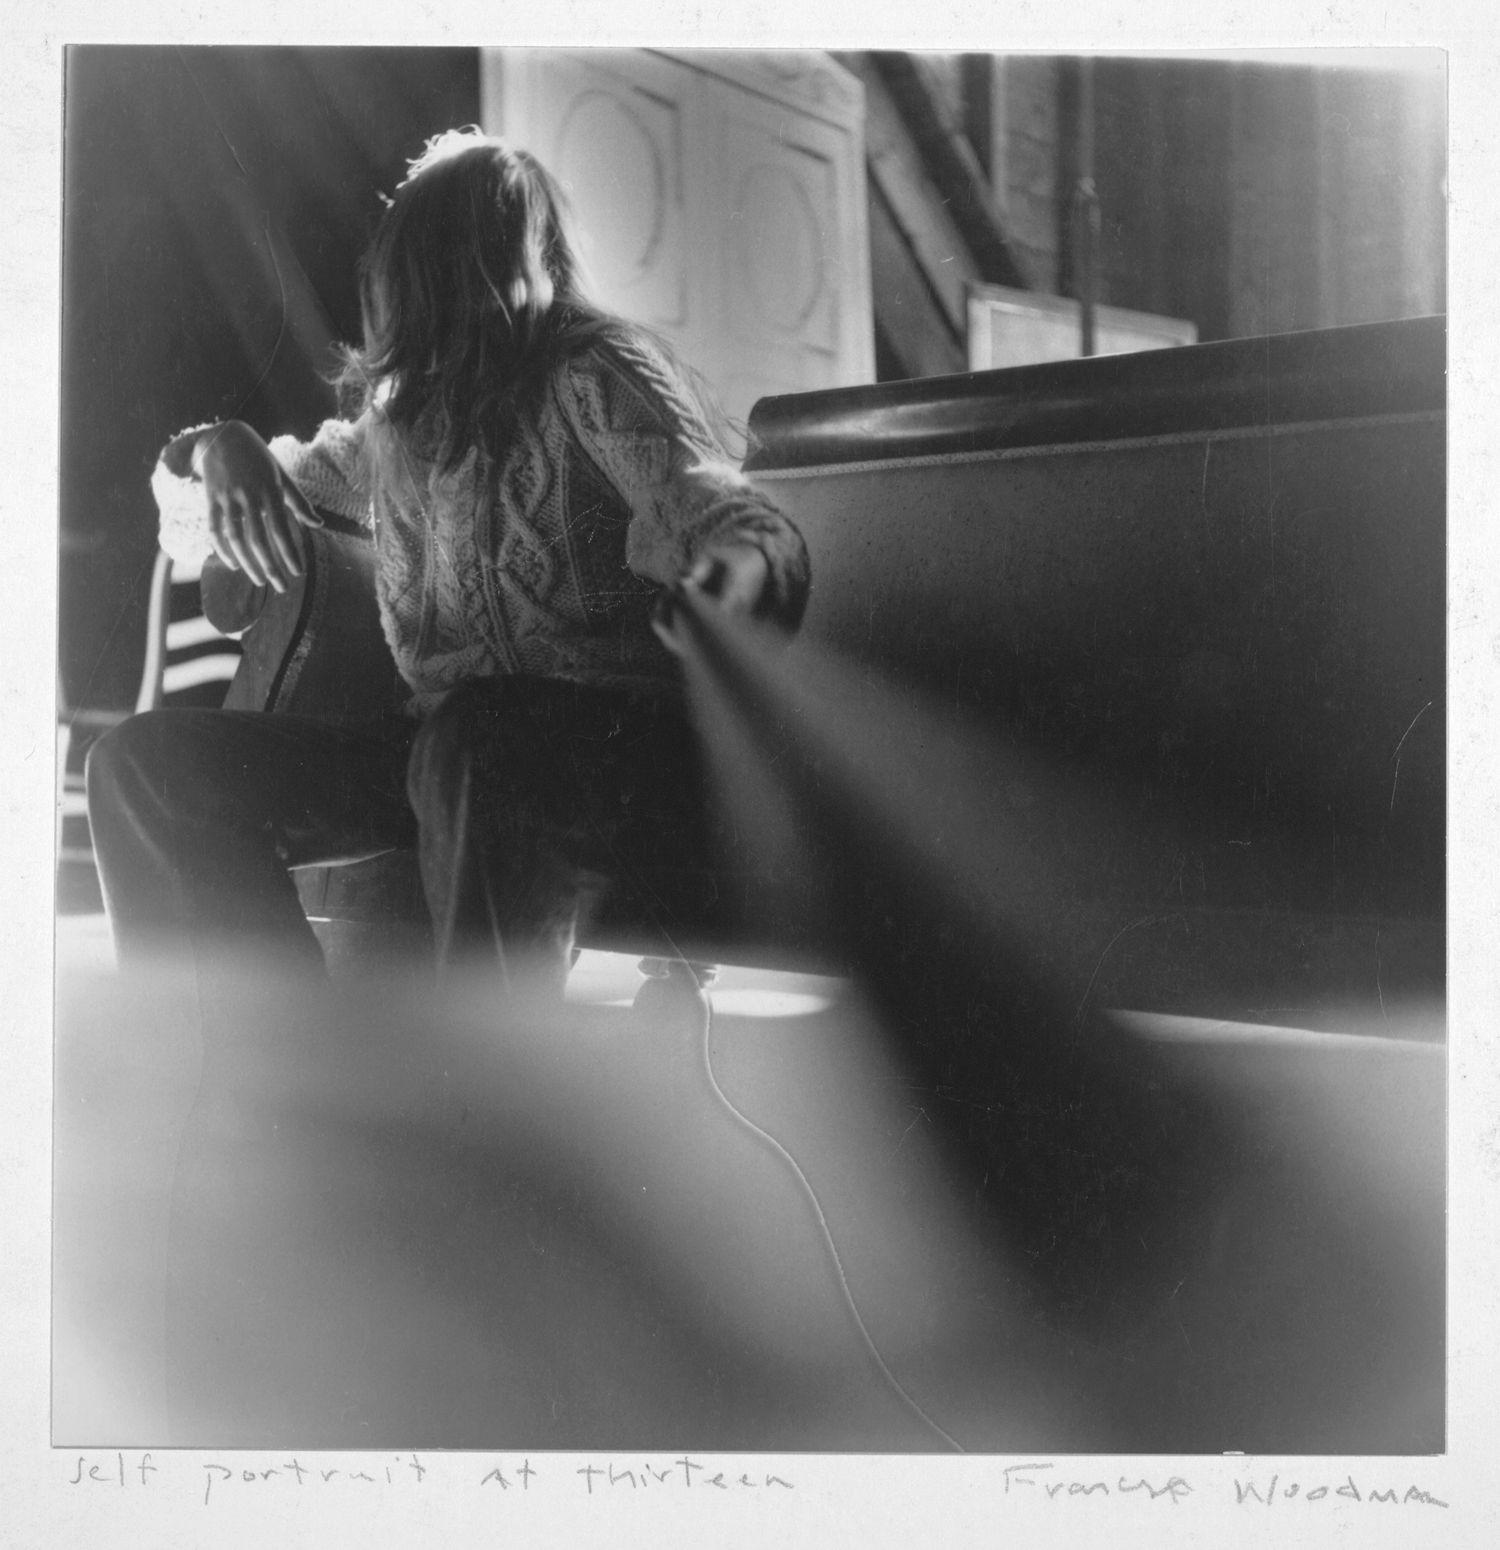 Francesca Woodman© – Self portrait at thirteen, Boulder, Colorado, 1972-1975